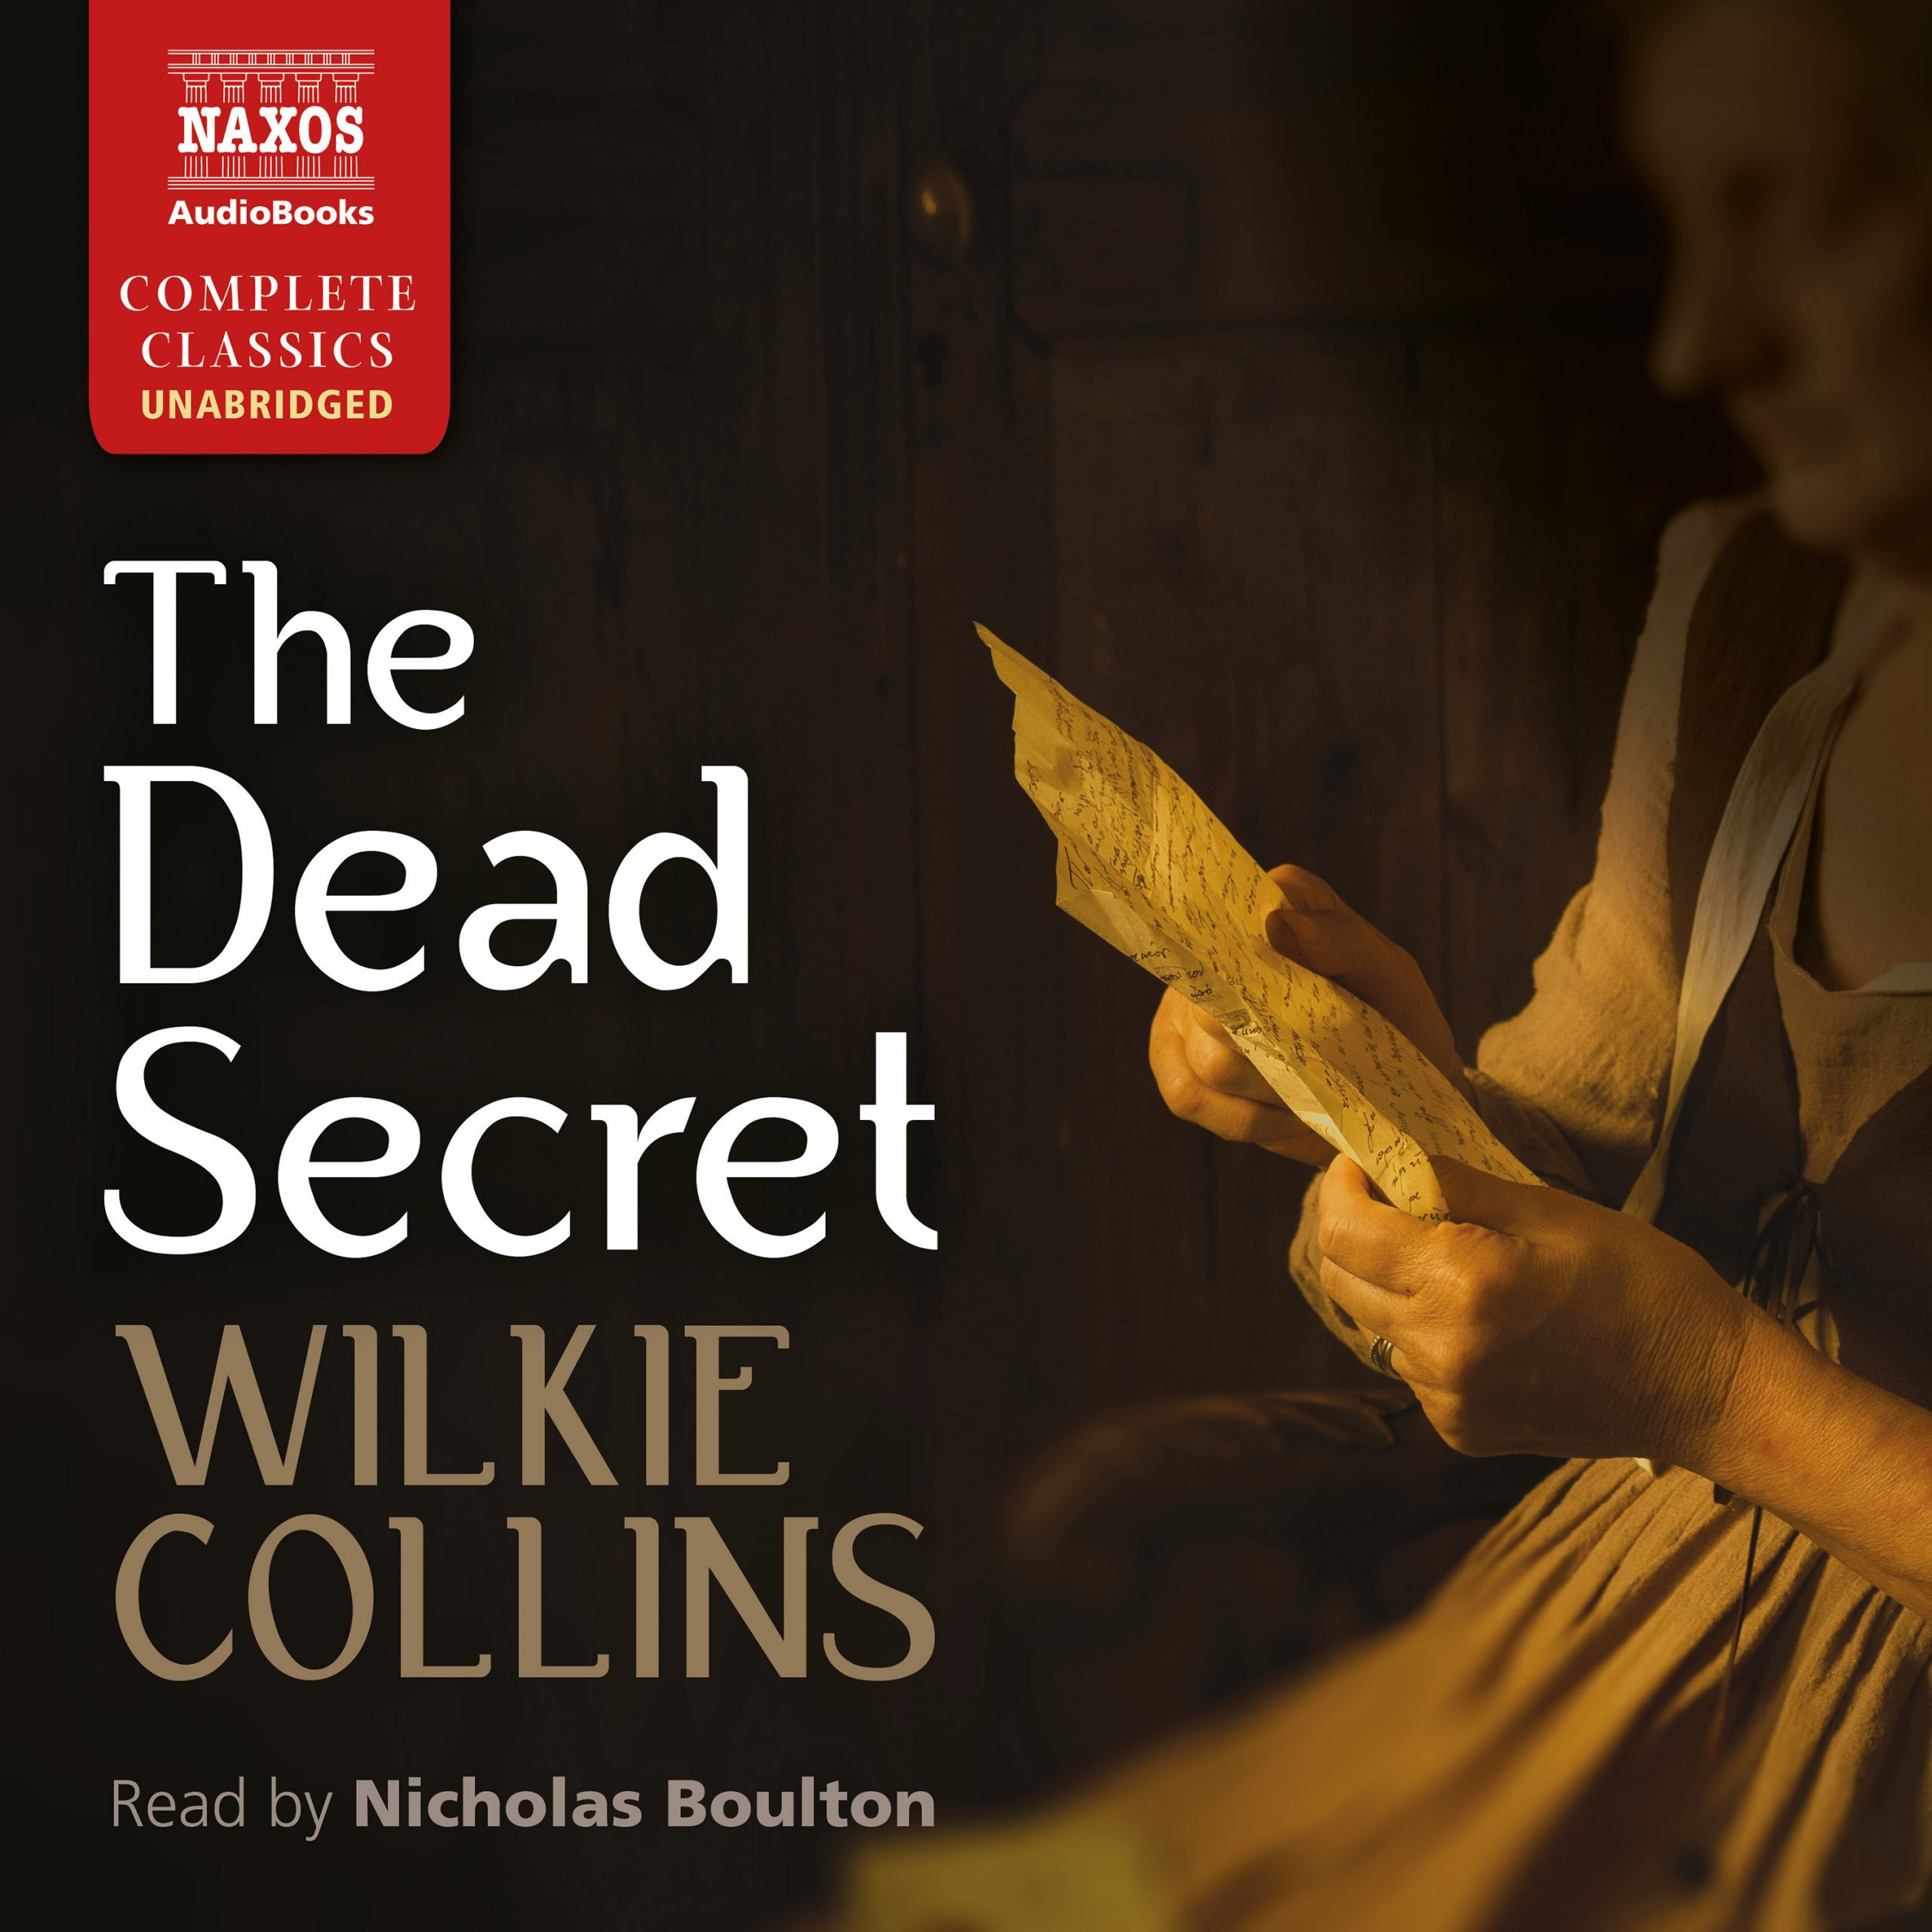 The Dead Secret (unabridged)